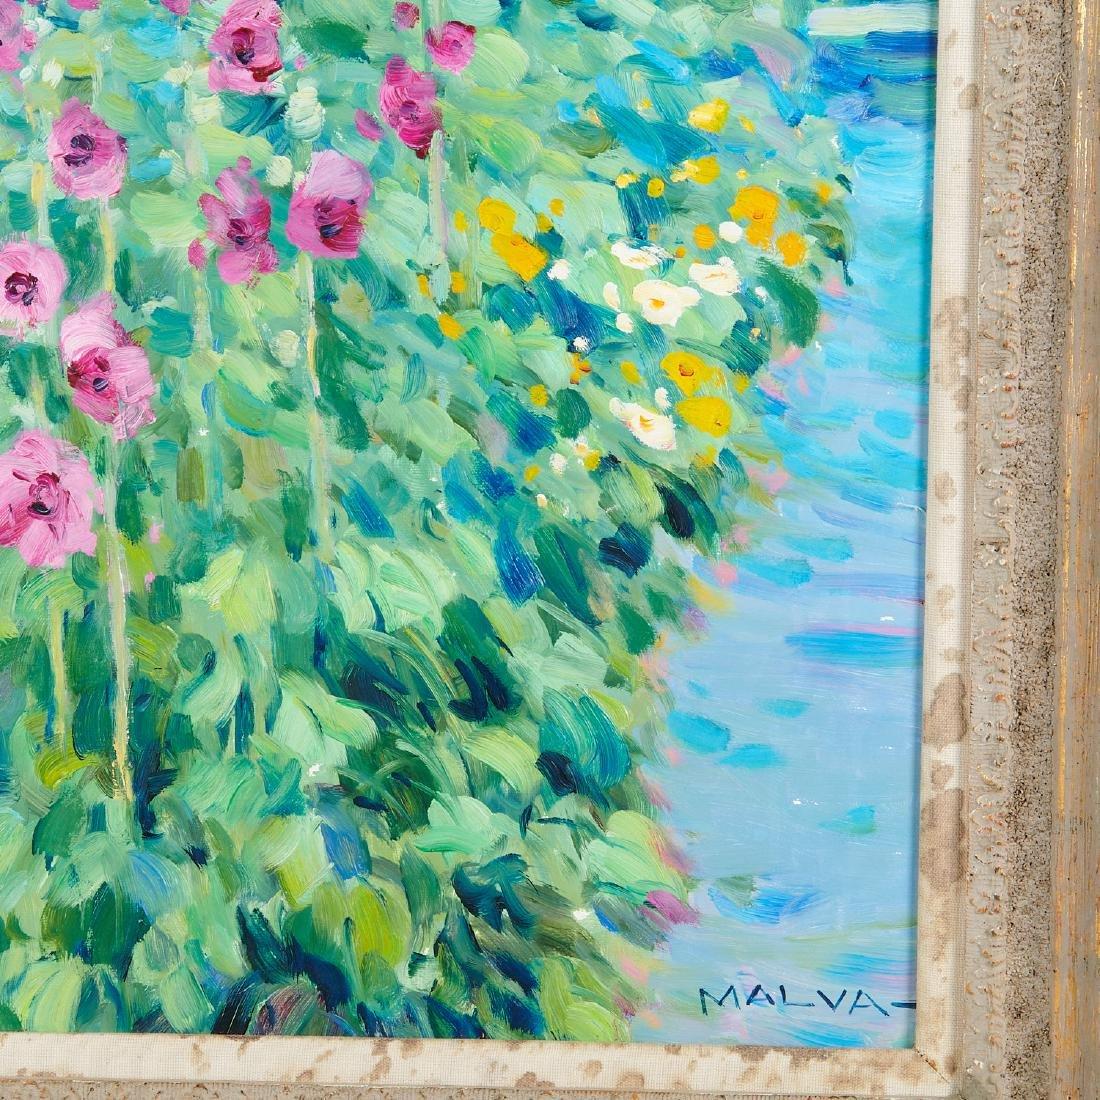 Malva, painting - 5